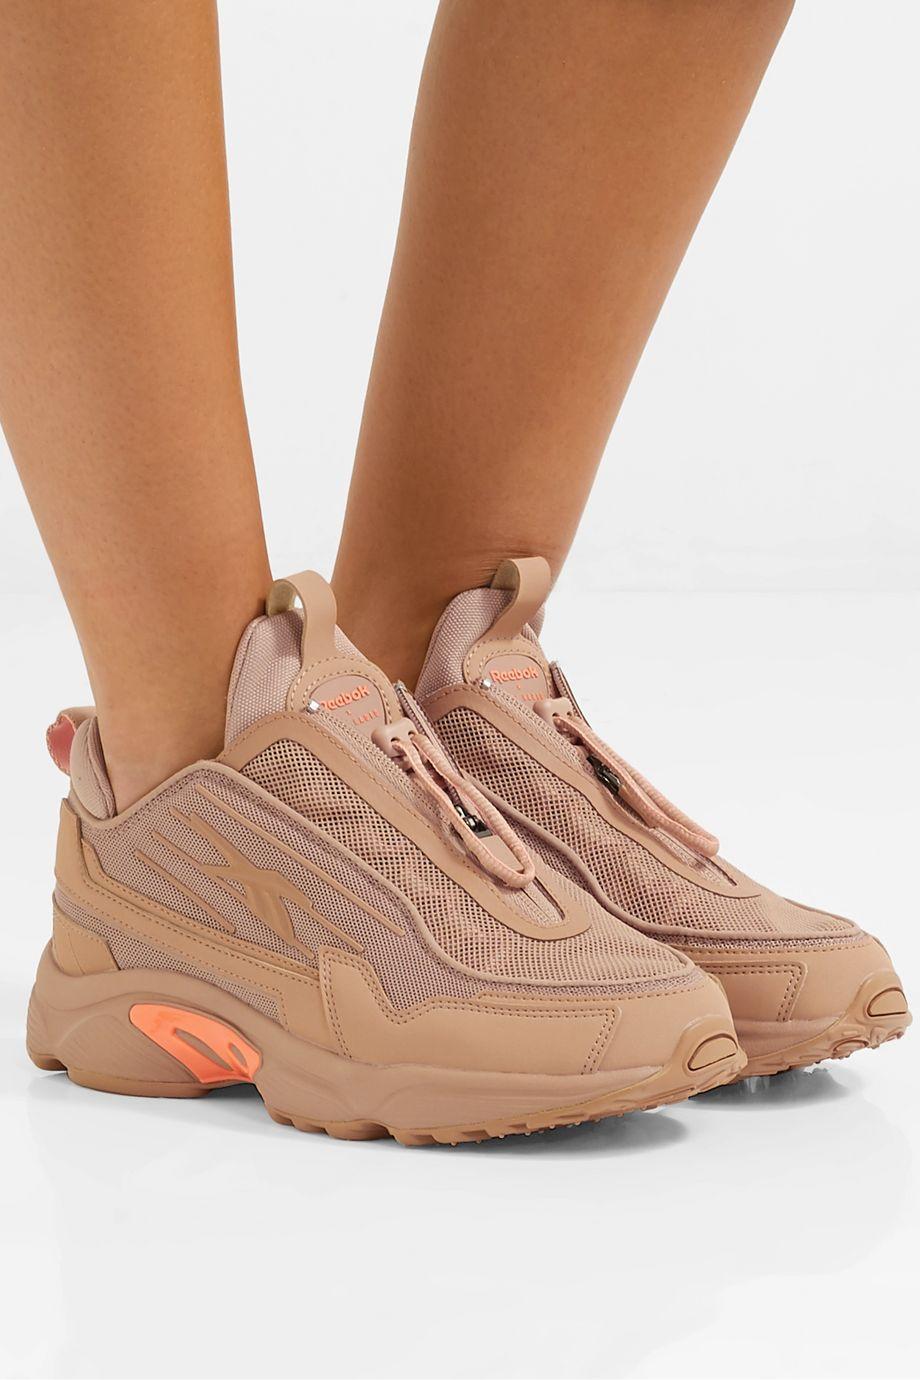 Reebok + Gigi Hadid DMX 2200 mesh and leather sneakers